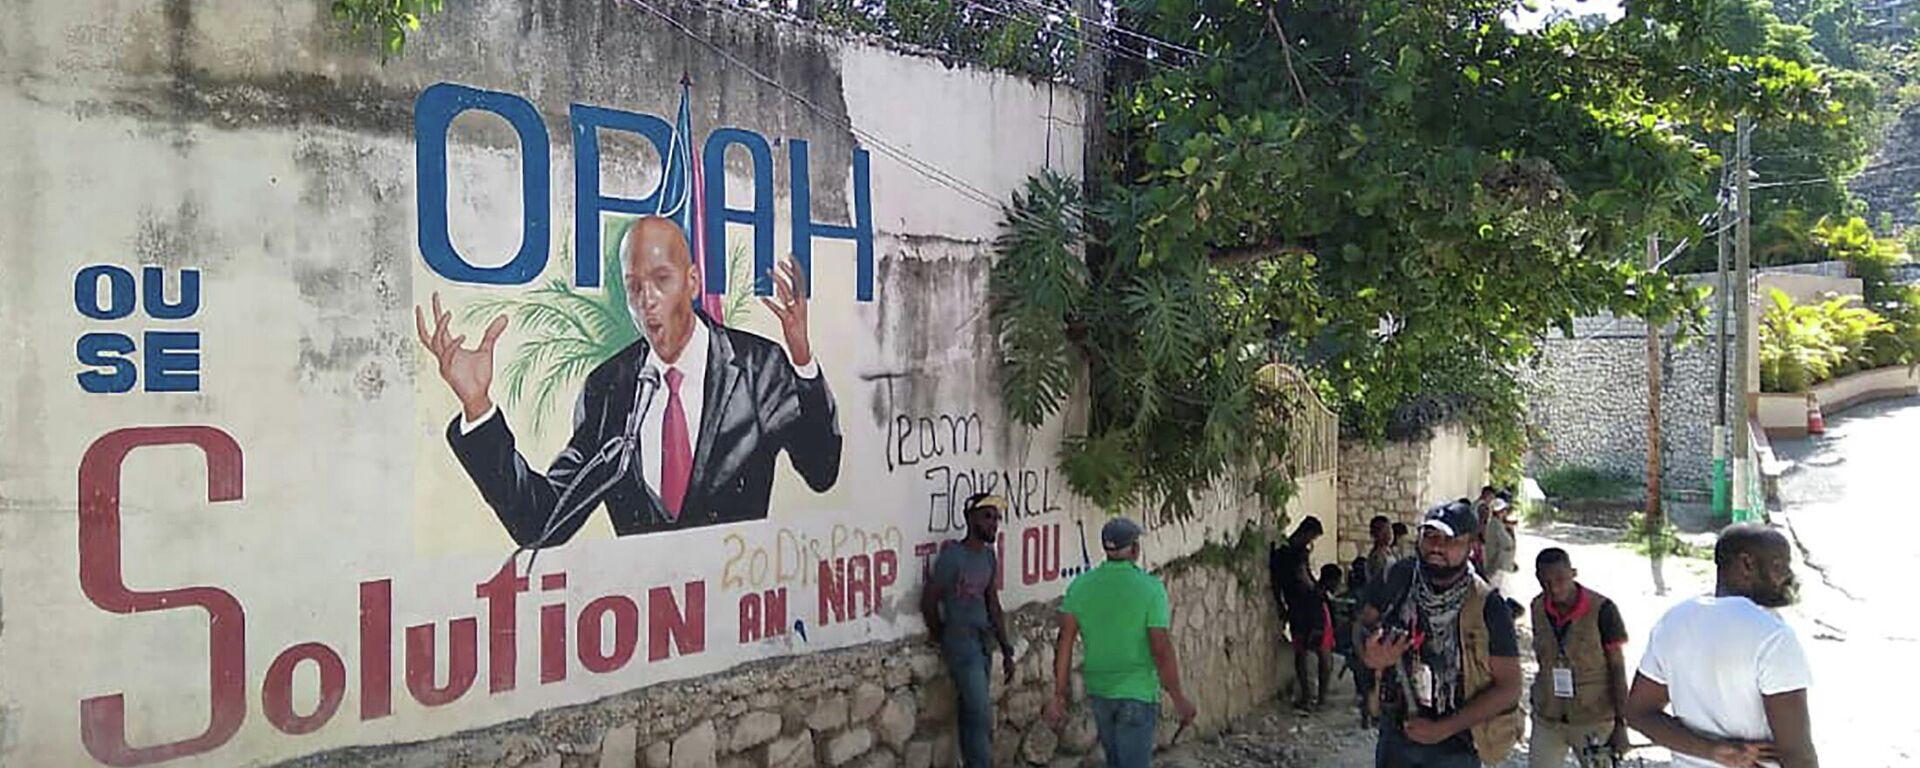 Mural con el presidente de Haití Jovenel Moise, asesinado el 7 de julio - Sputnik Mundo, 1920, 28.07.2021